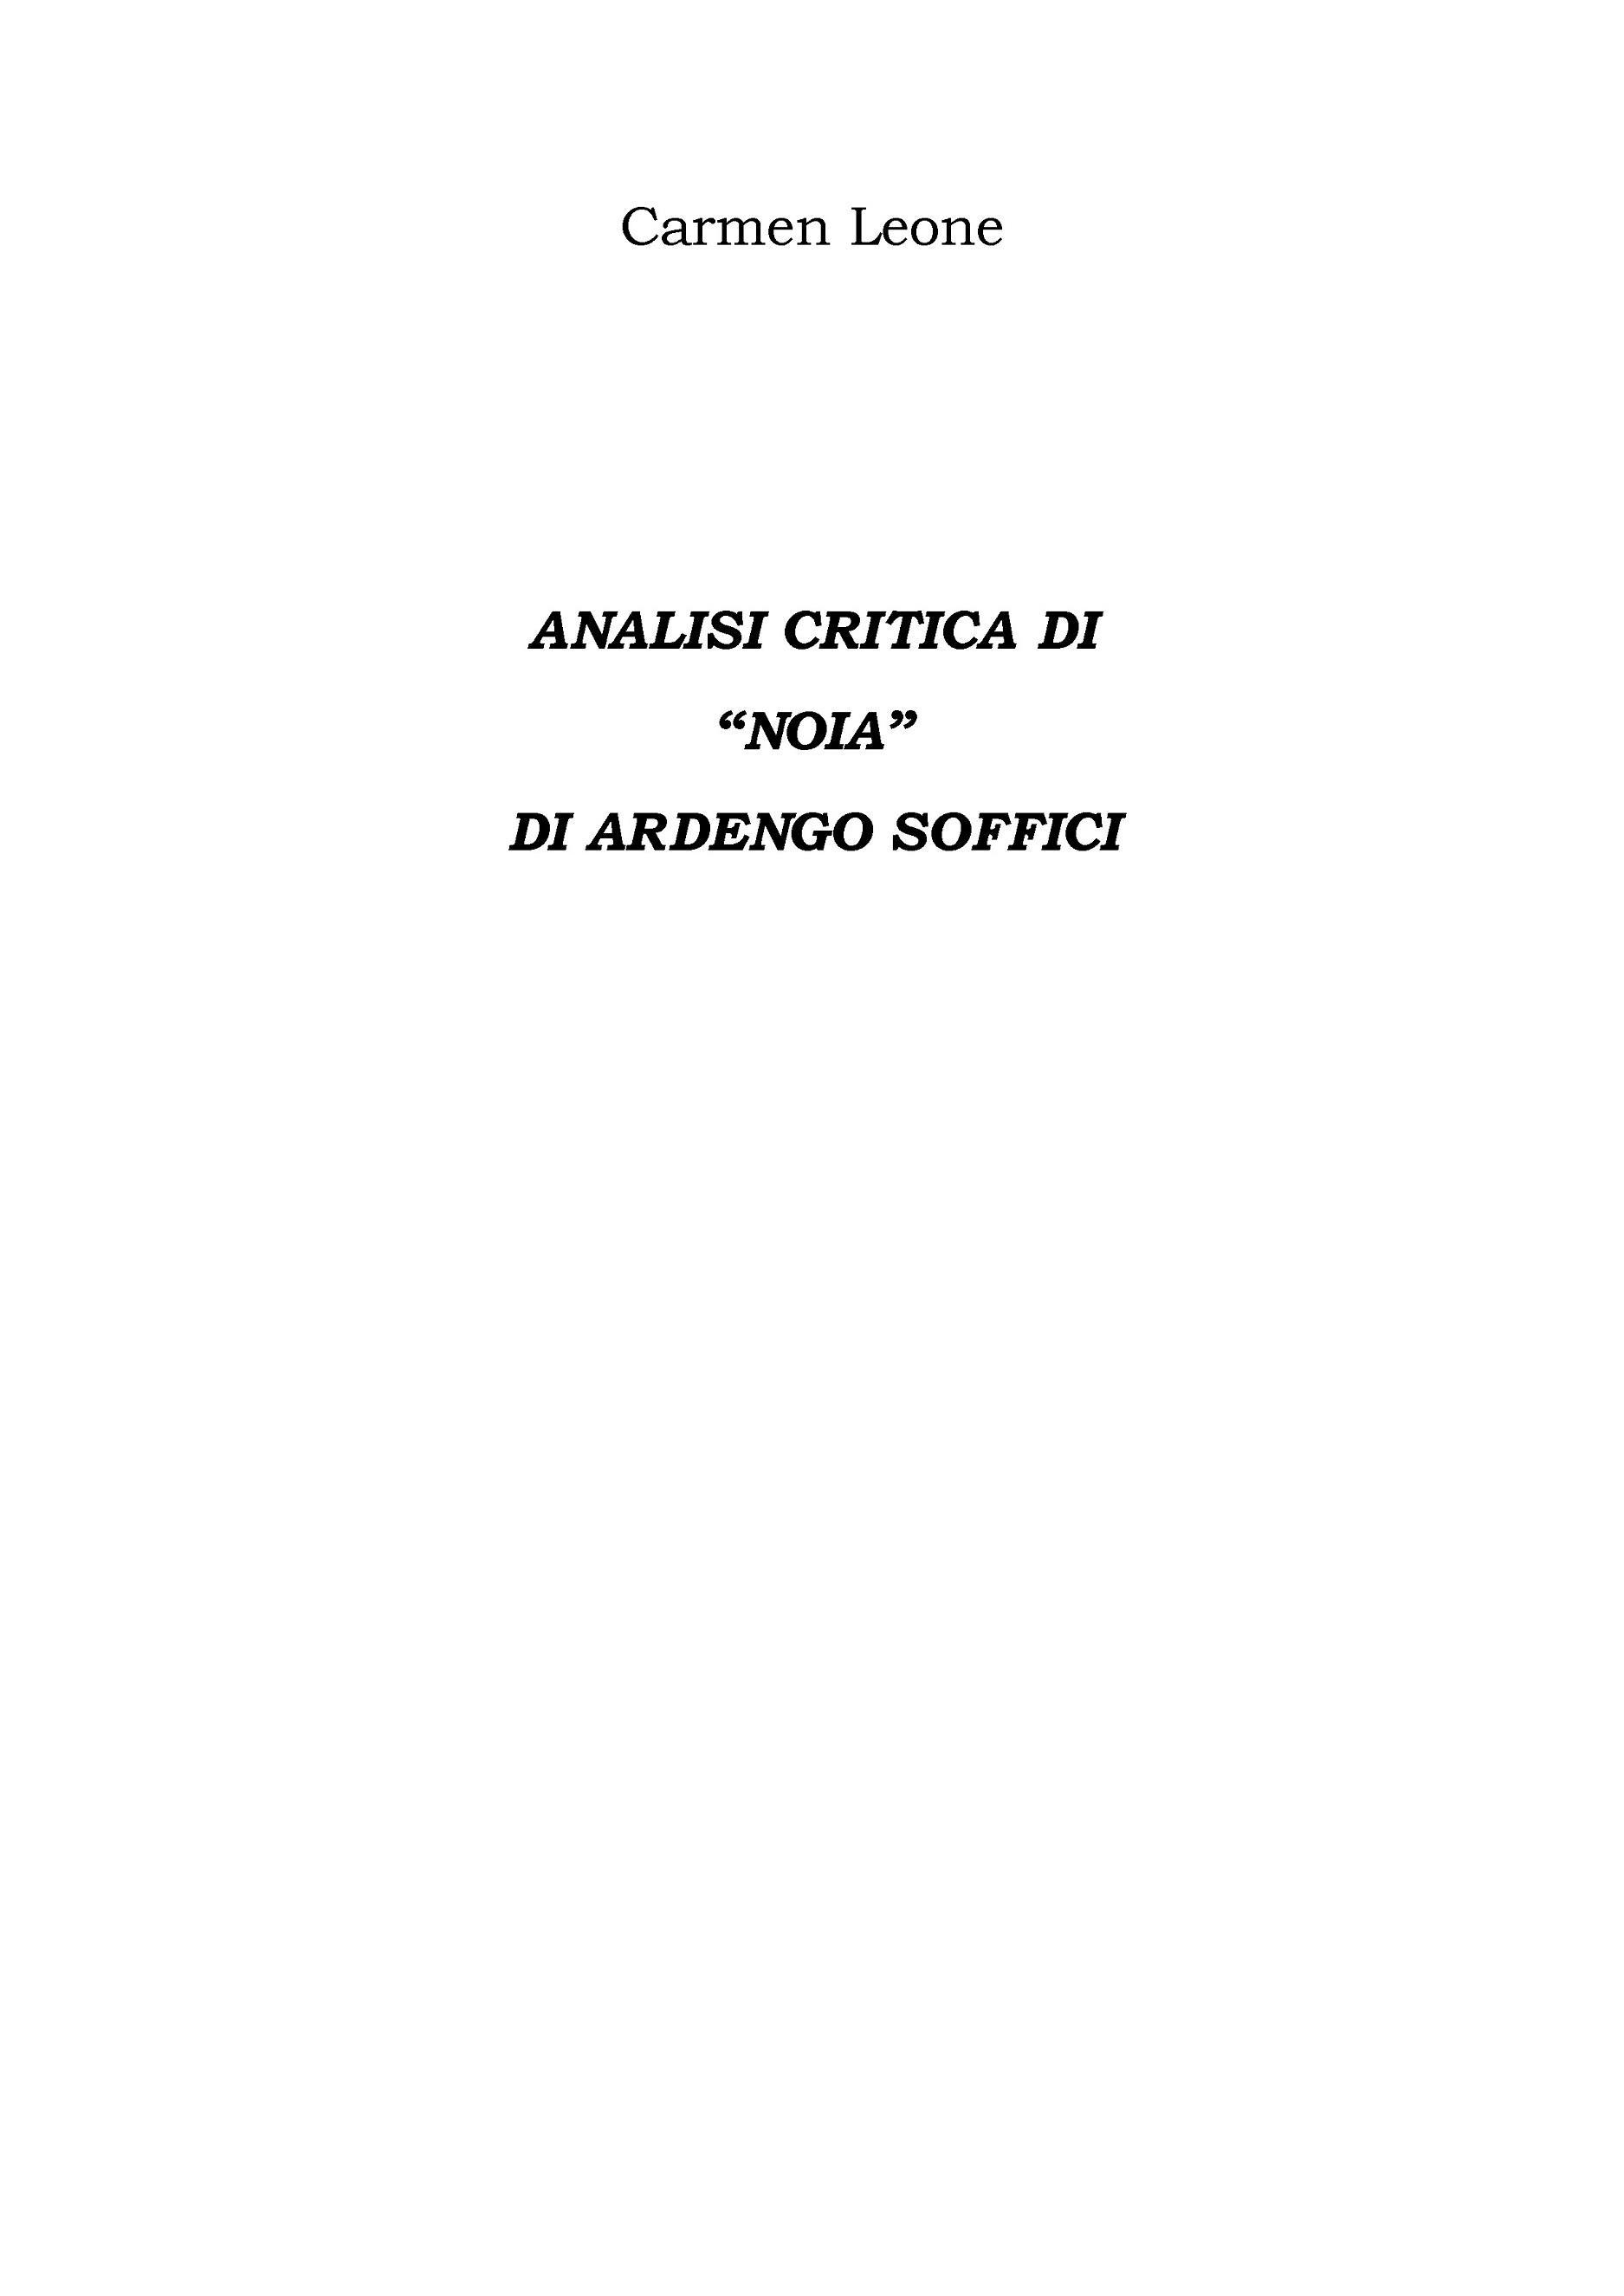 "Analisi Critica Di ""Noia"" Di Ardengo Soffici"